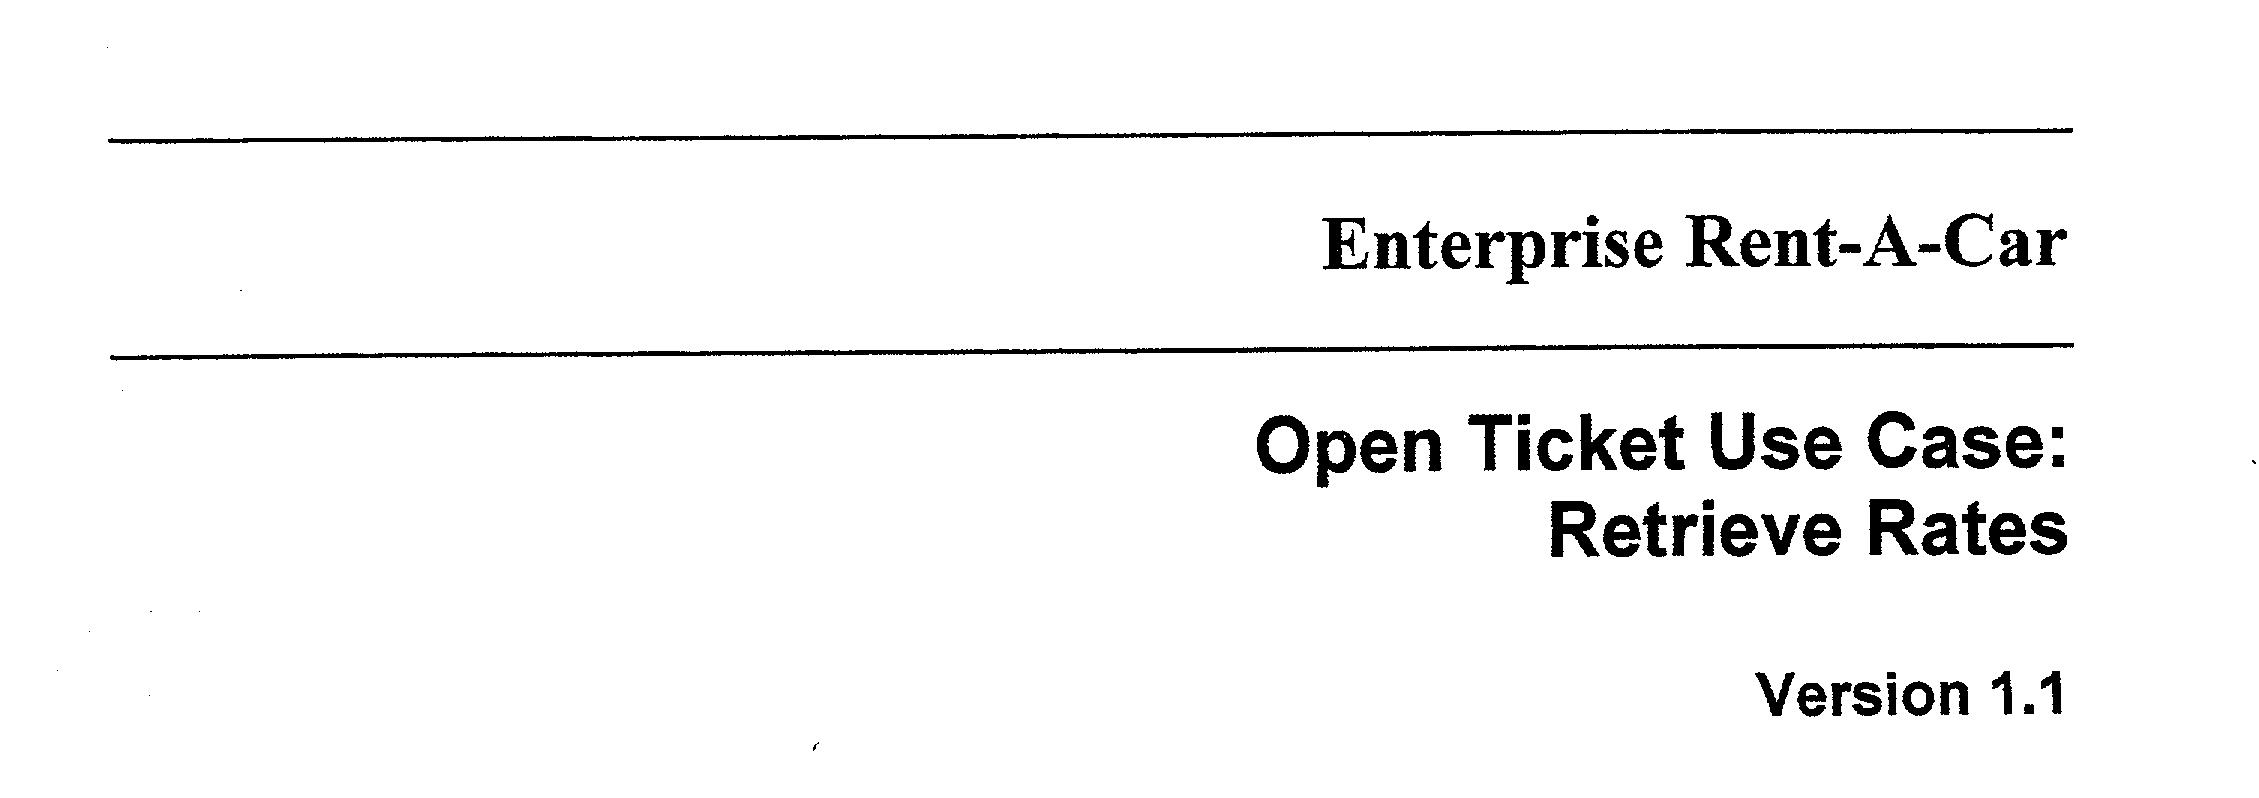 Figure US20030125992A1-20030703-P01598